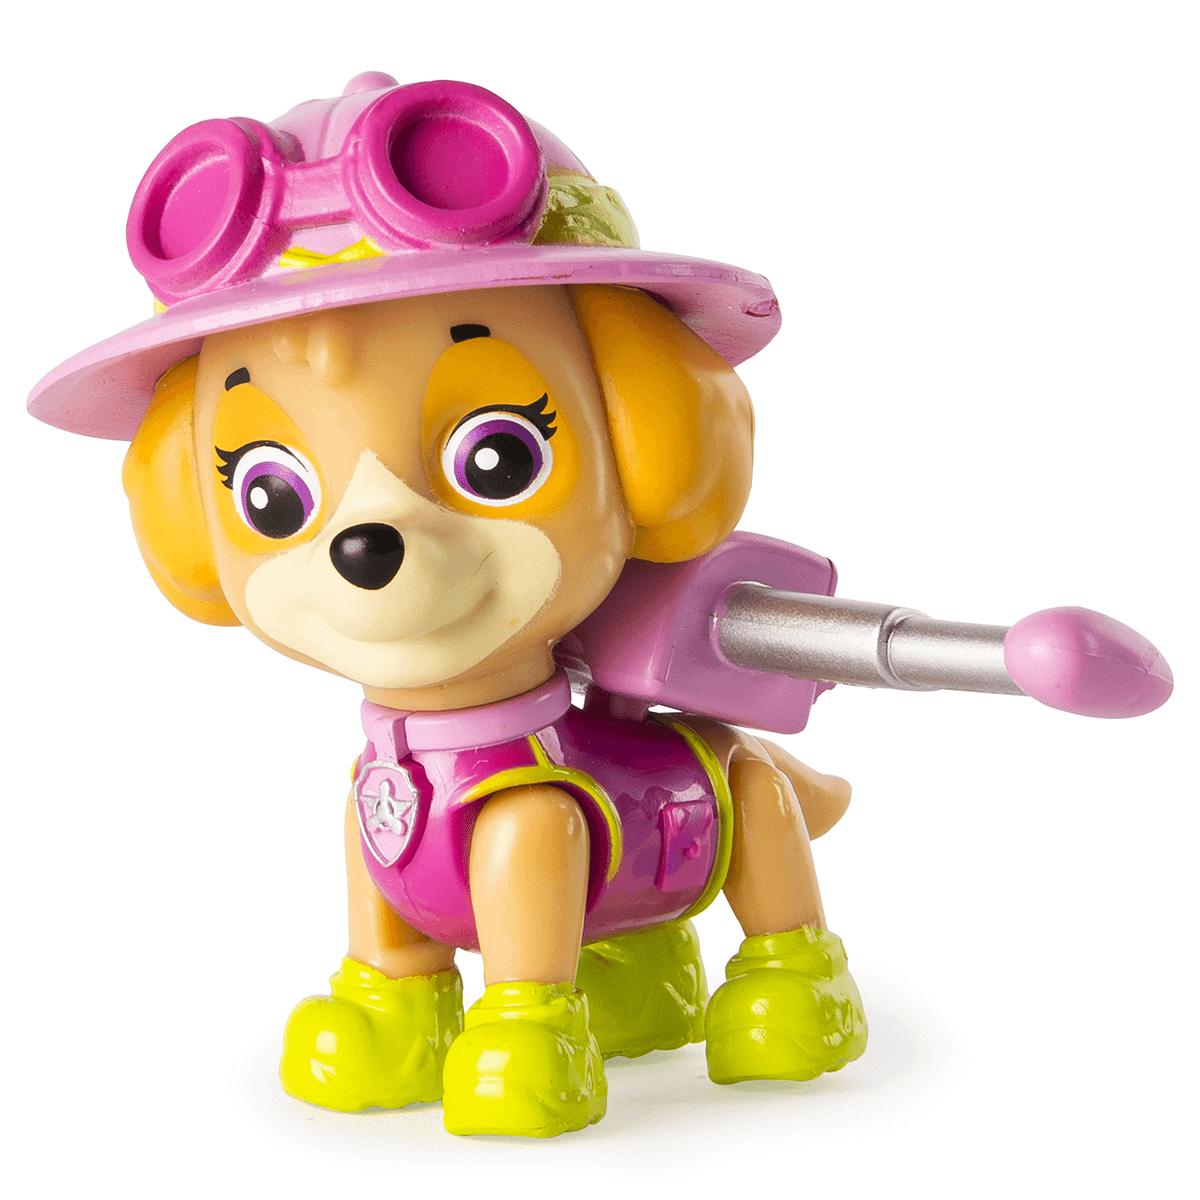 Paw Patrol Jungle Rescue Figure - Skye